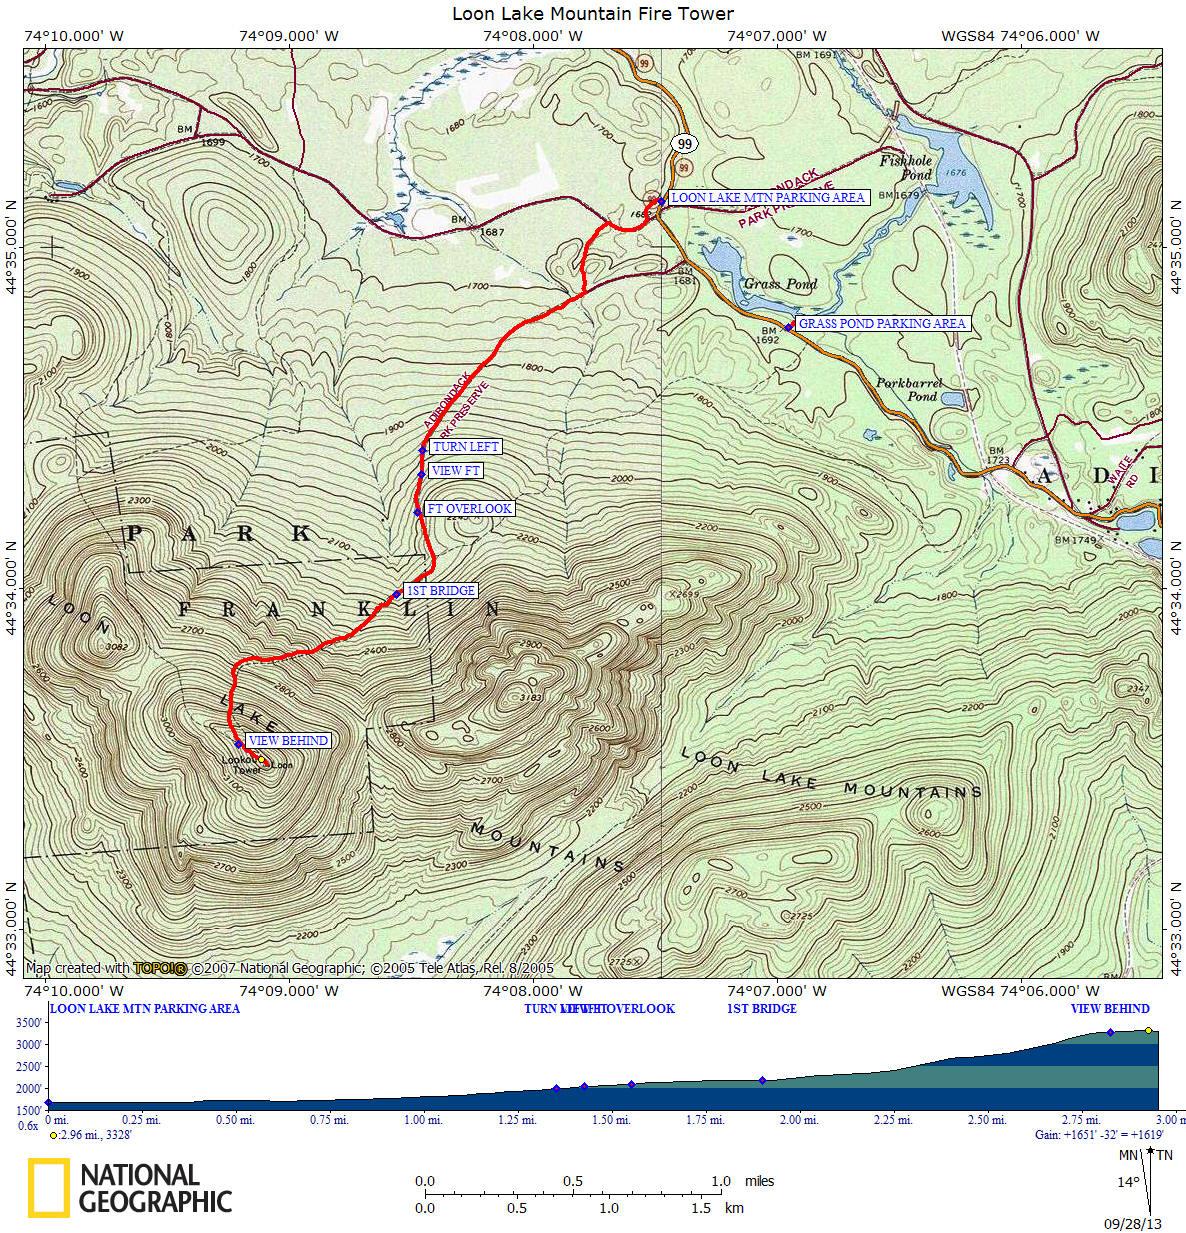 Loonlakemountaintrailmapg dec map that is at the kiosk publicscrutiny Choice Image